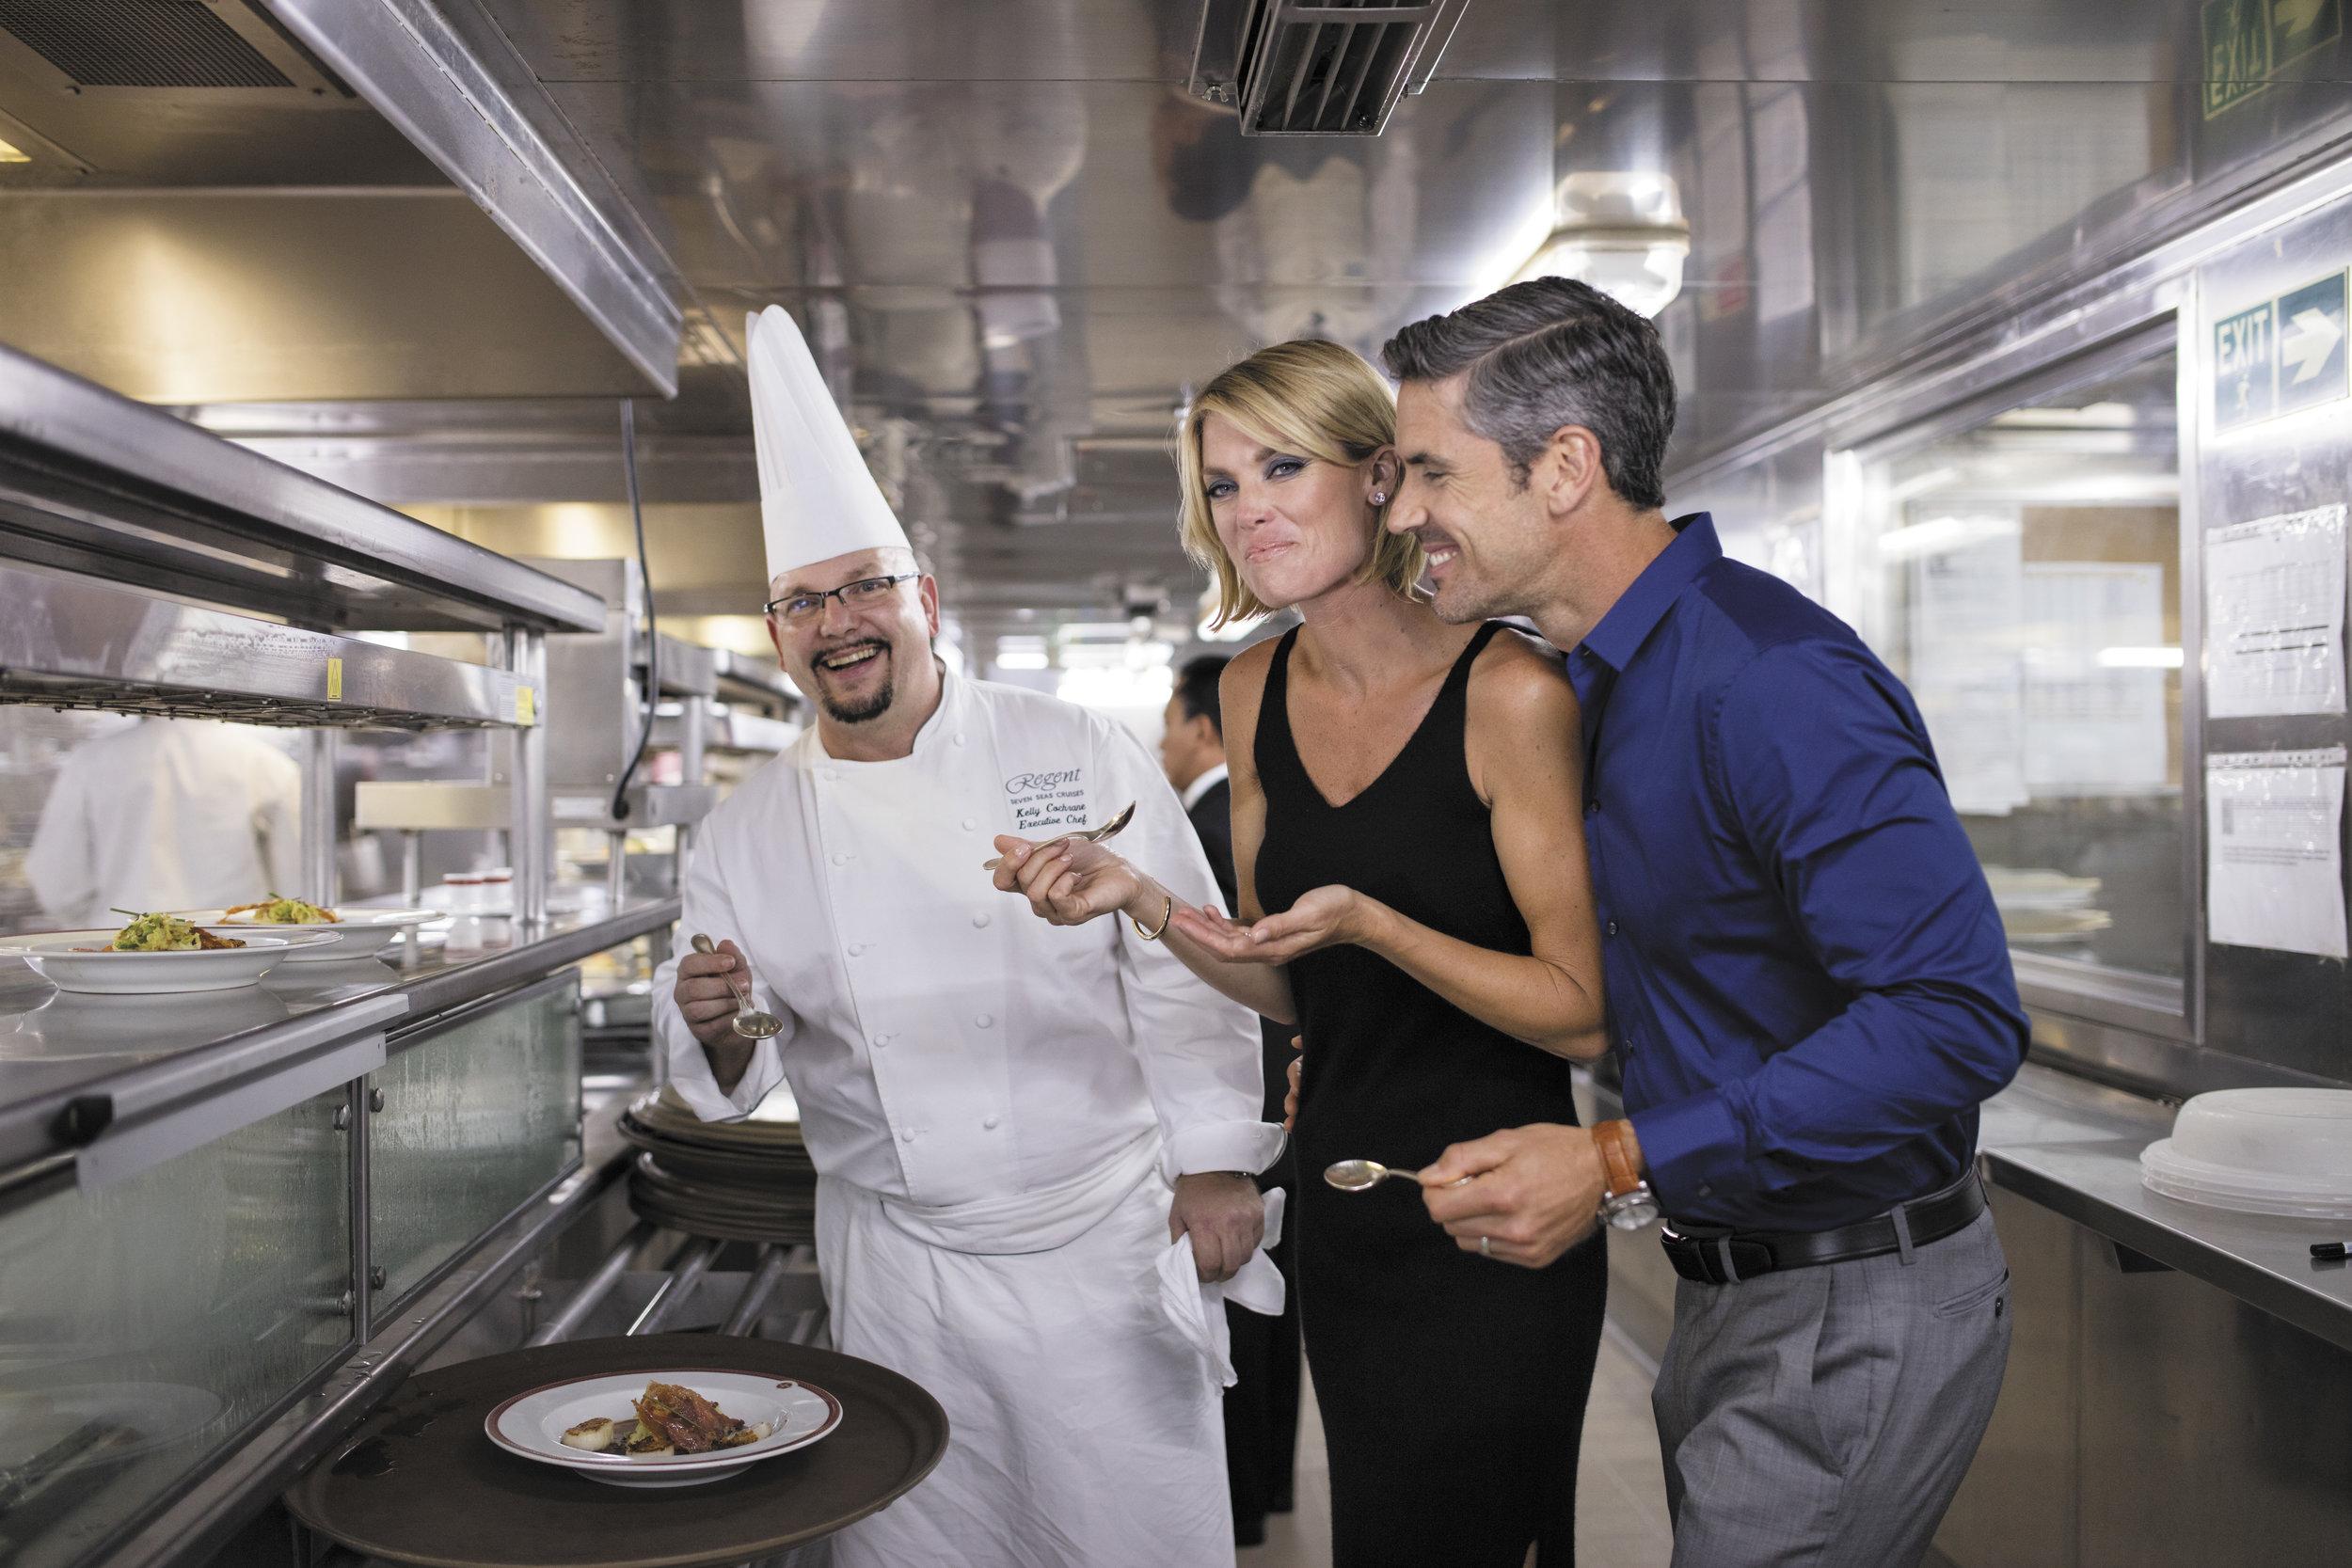 Chef Tasting Couple.jpg